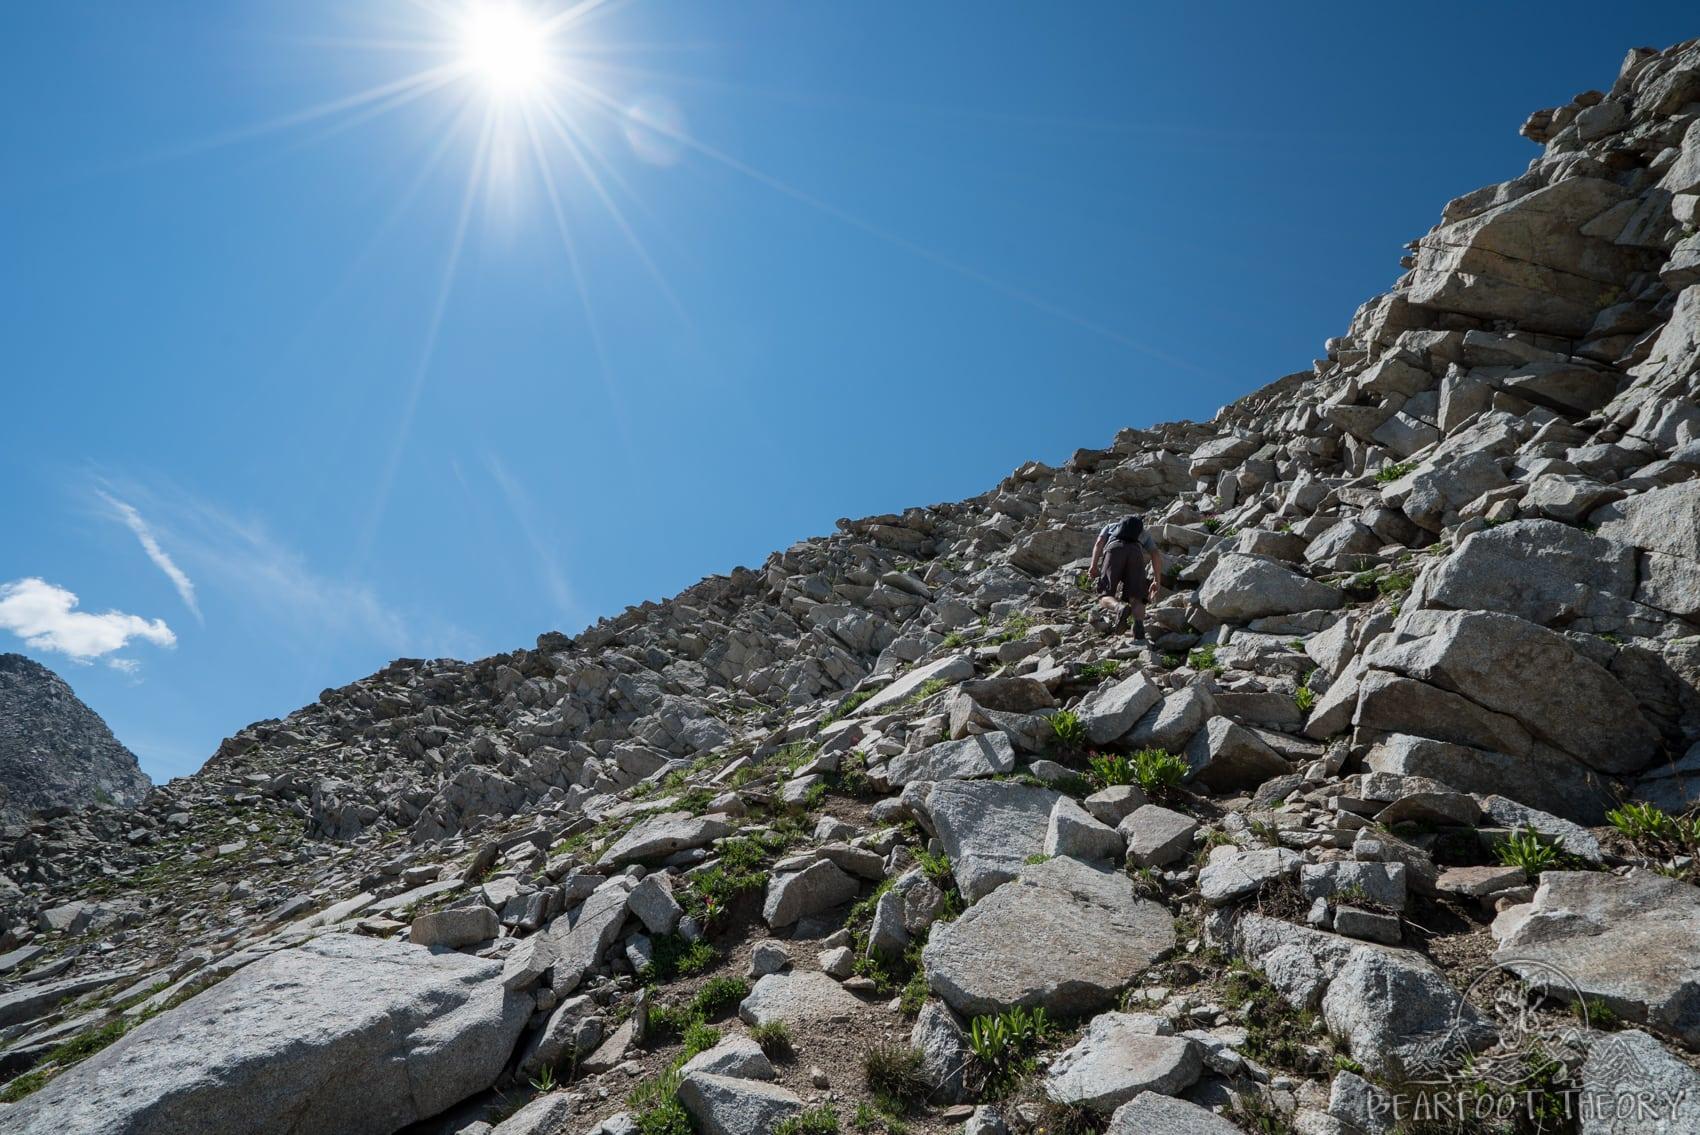 Hiking up to the Pfeifferhorn, the third tallest peak near Salt Lake City